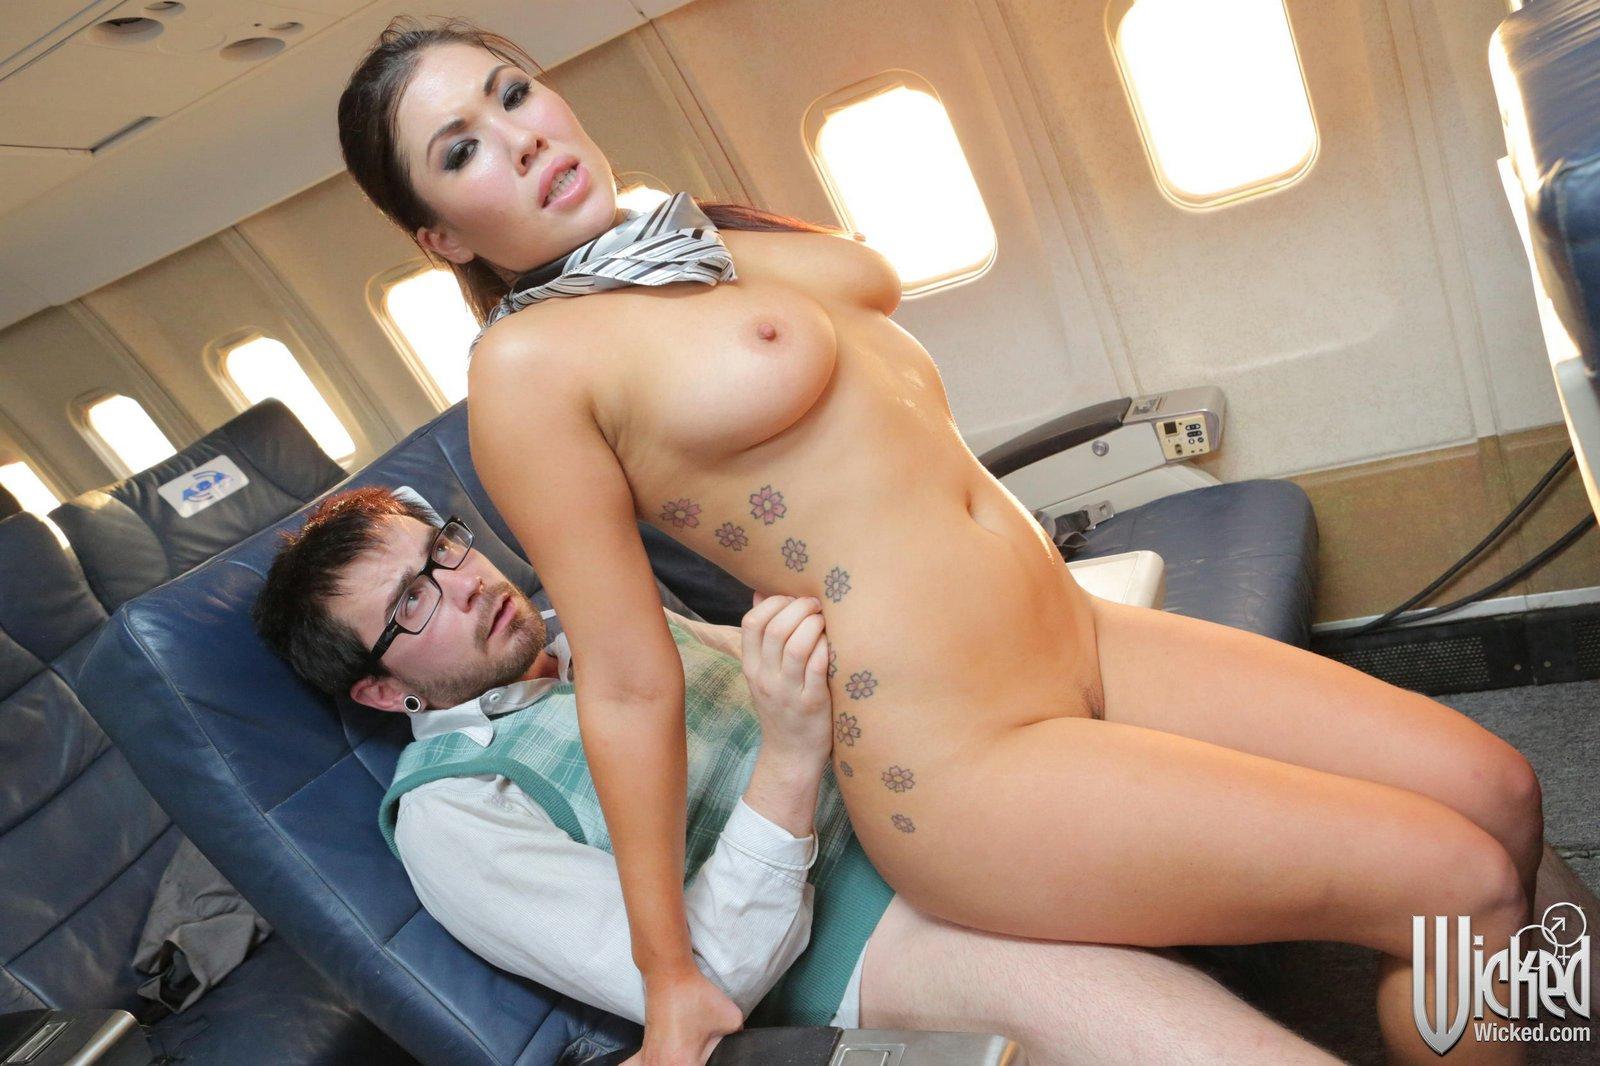 Naked guy en girl in sauna